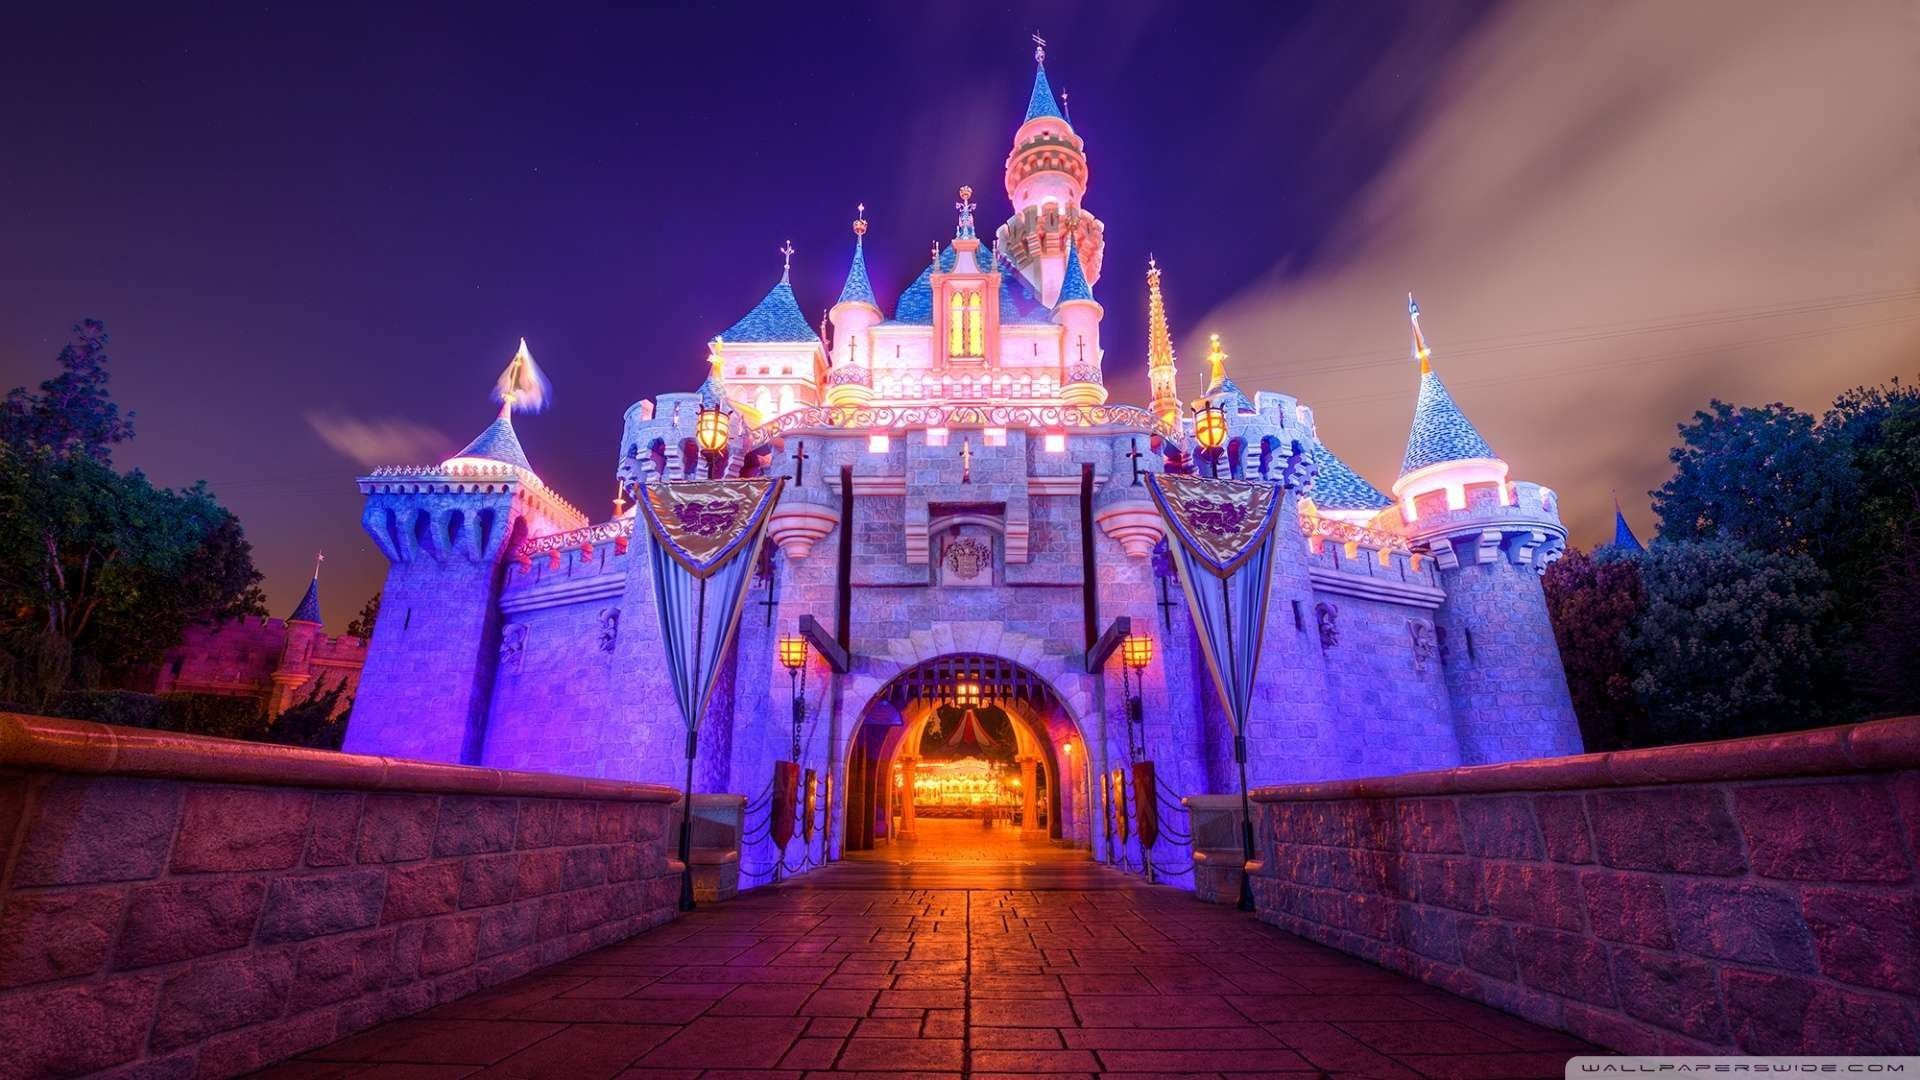 Hd Disney Castle Wallpaper Nice Castles Sleeping Beauty Castle Disney Tourist Blog Disneyland Castle